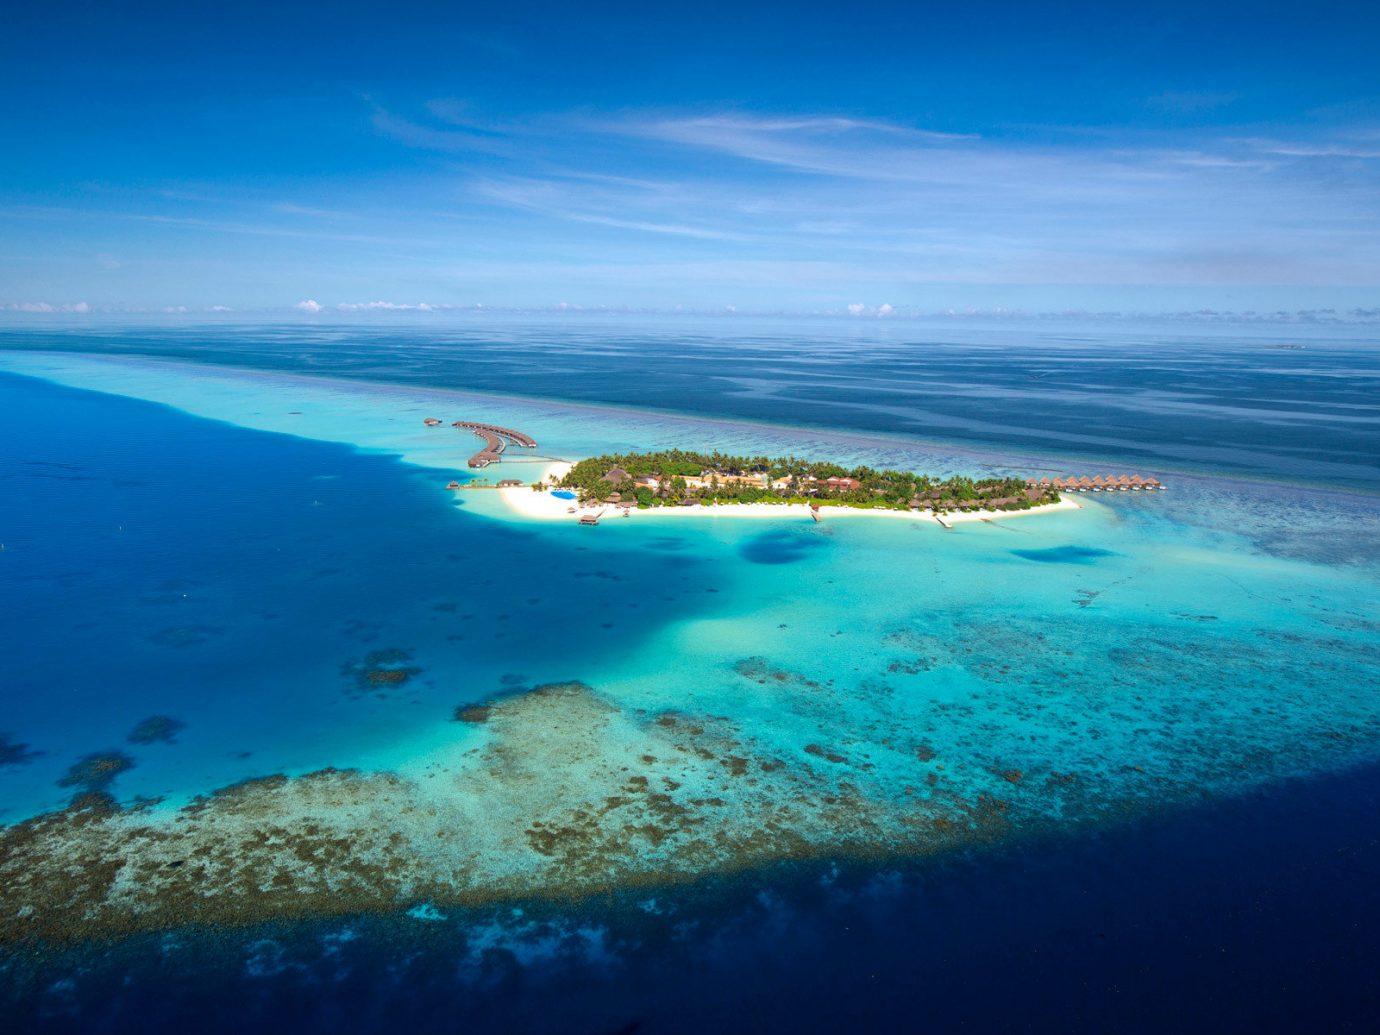 Trip Ideas water Nature reef Sea geographical feature landform Ocean horizon blue archipelago Coast wind wave Beach islet Island atoll wave cape Lagoon bay shore swimming